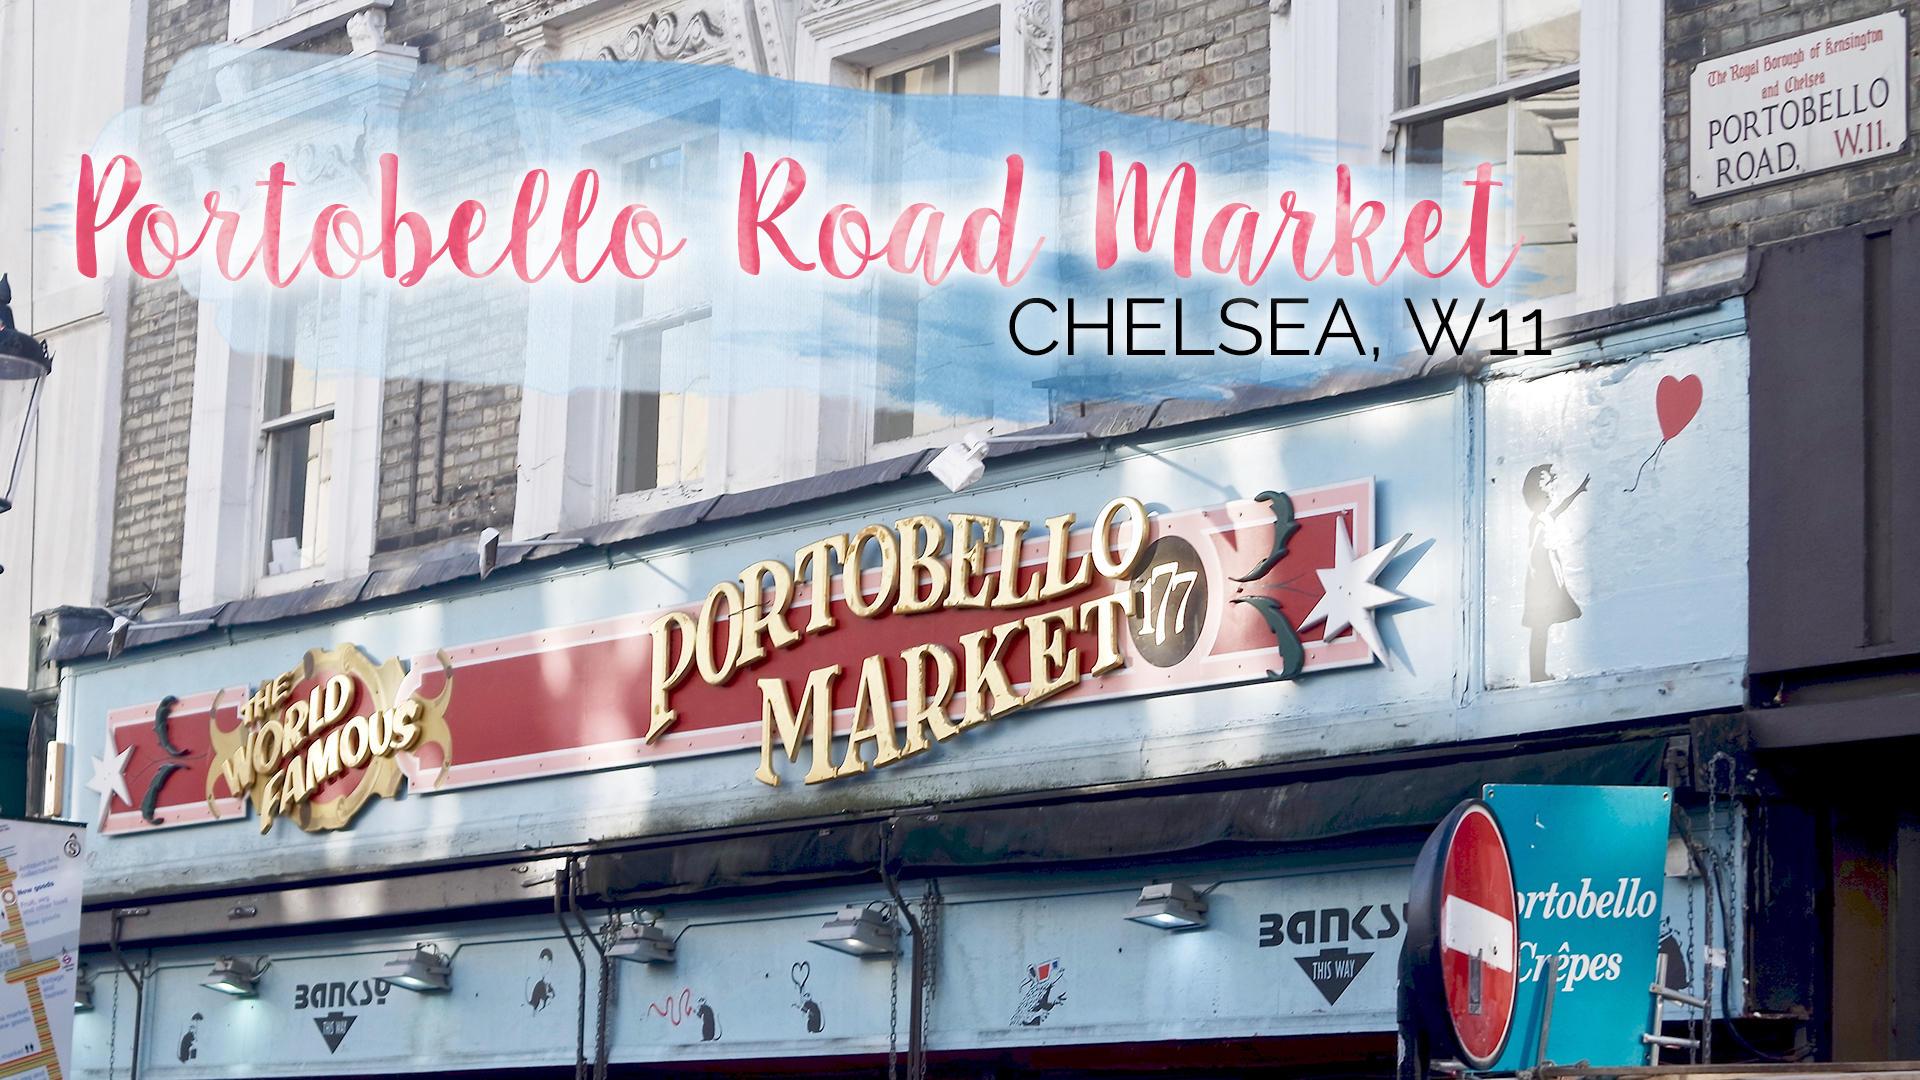 Saturday Mornings at Portobello Road Market, Chelsea |